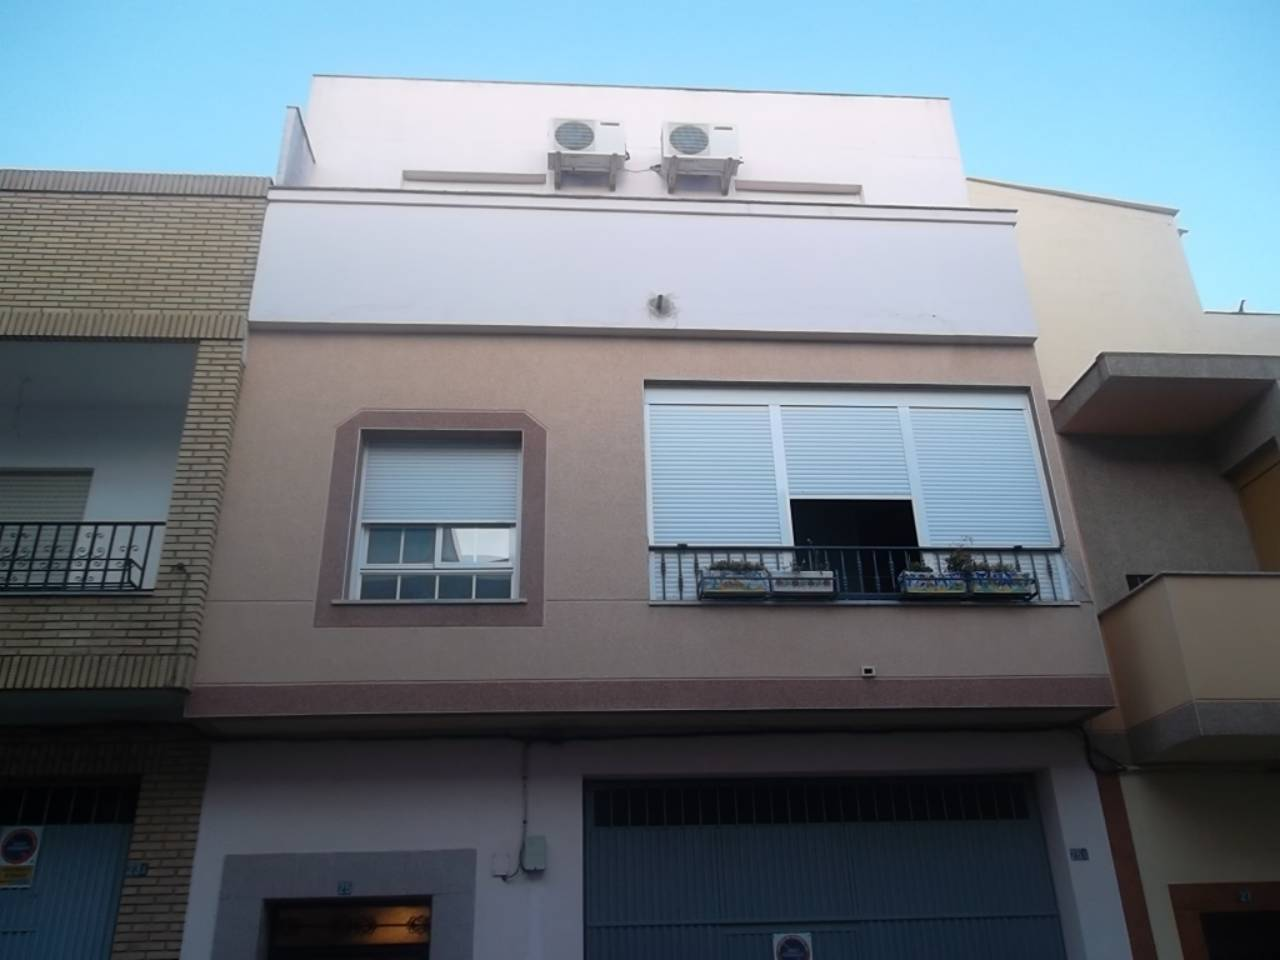 Piso en venta en Badajoz Capital